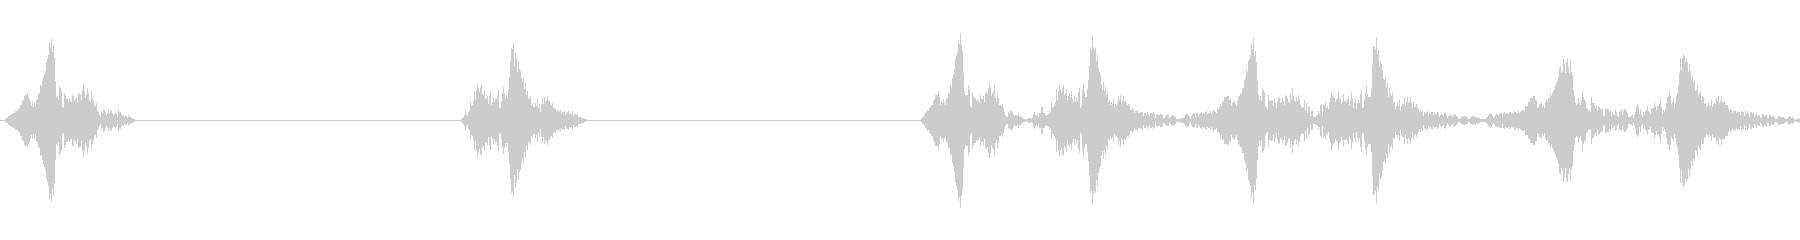 BPM90に合わせたレコードスクラッチの未再生の波形